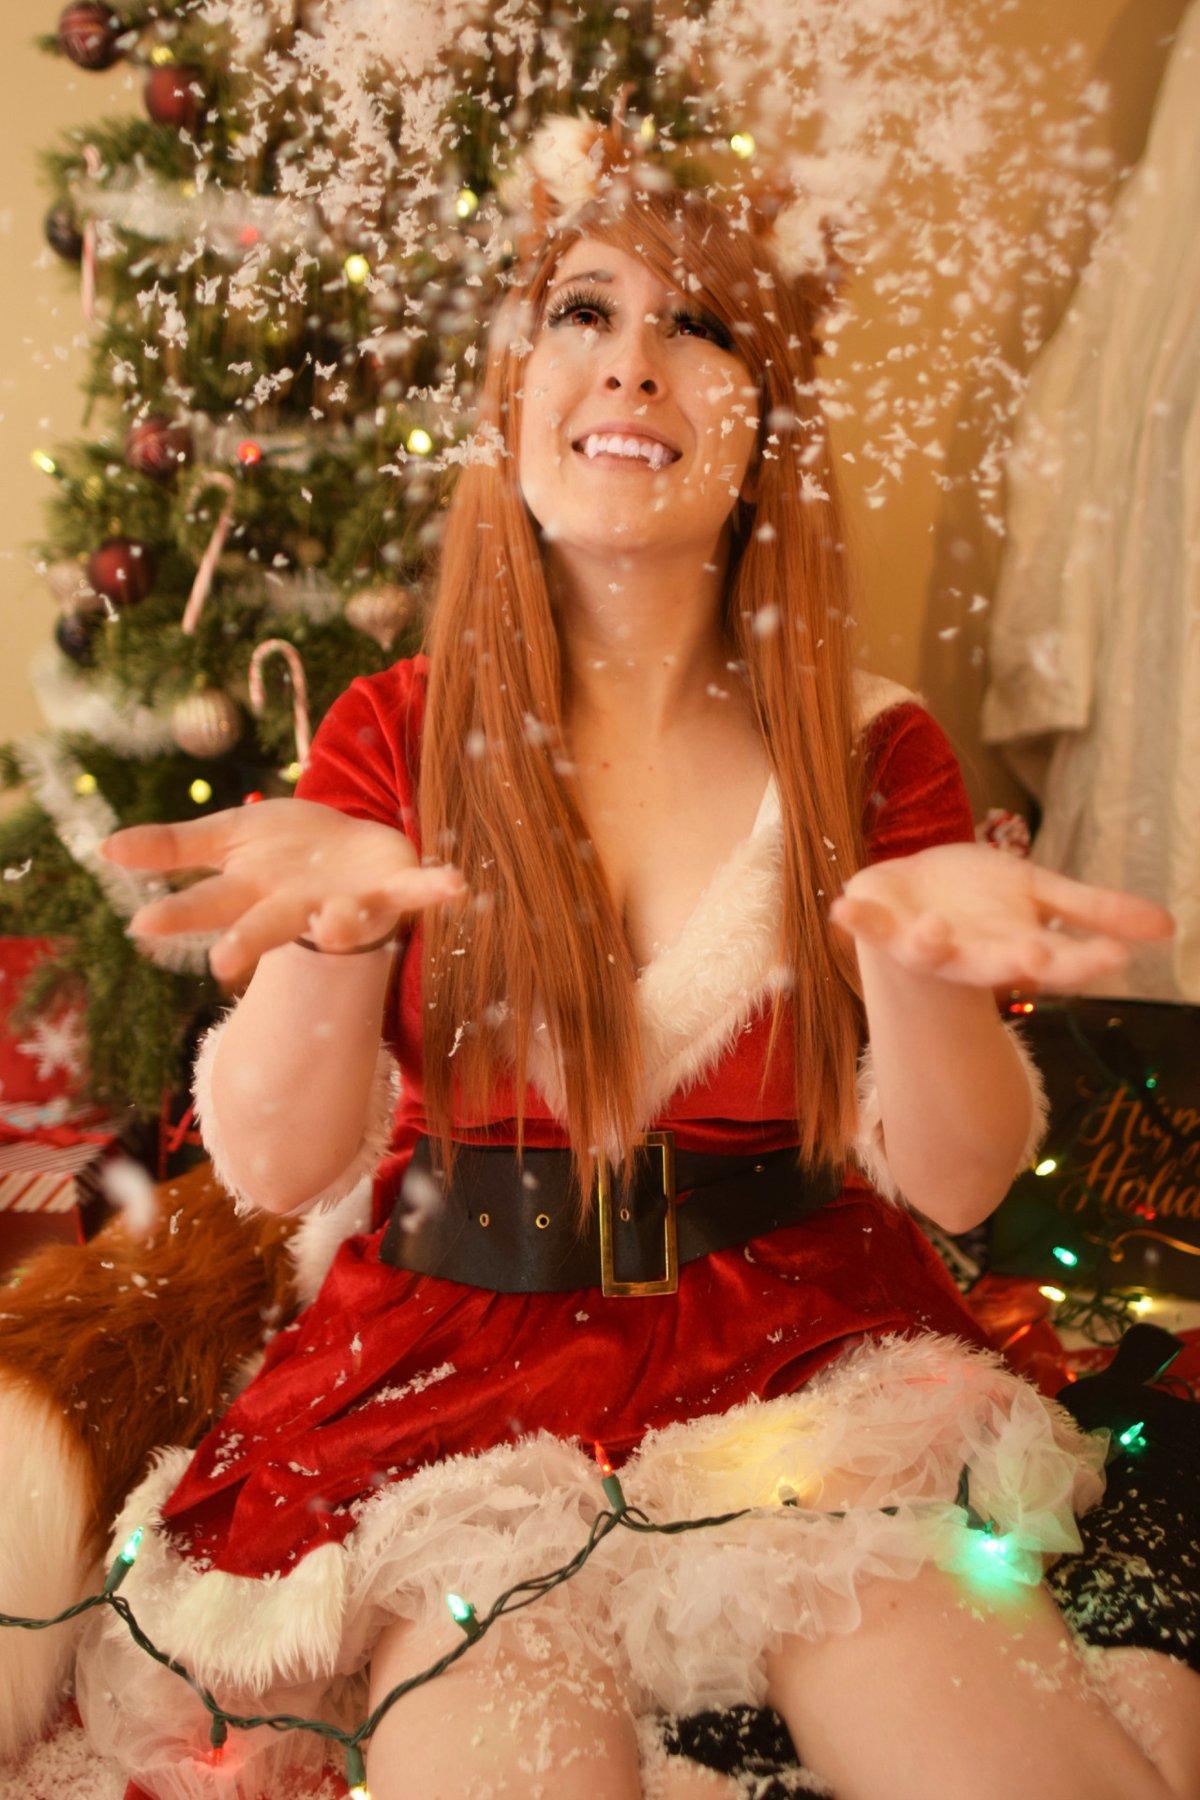 Image of Christmas Holo Photoset